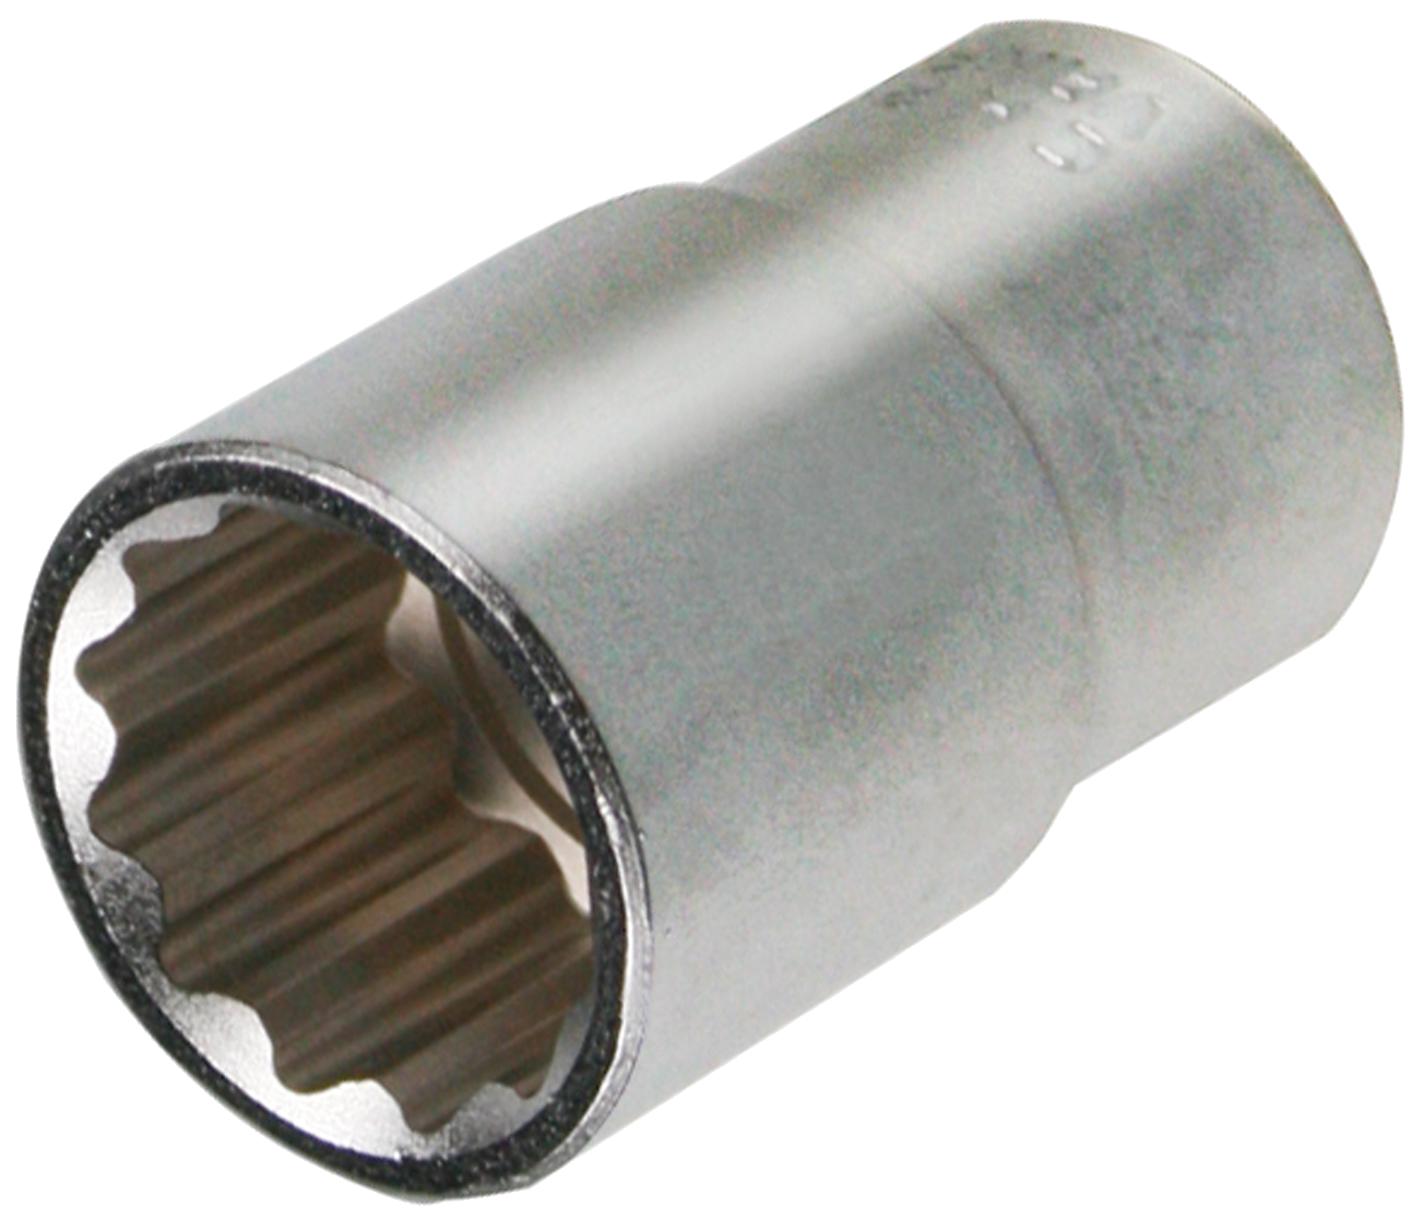 SWSTAHL Steckschlüsseleinsatz, 1/2 Zoll, Zwölfkant, 30 mm 05640-30SB